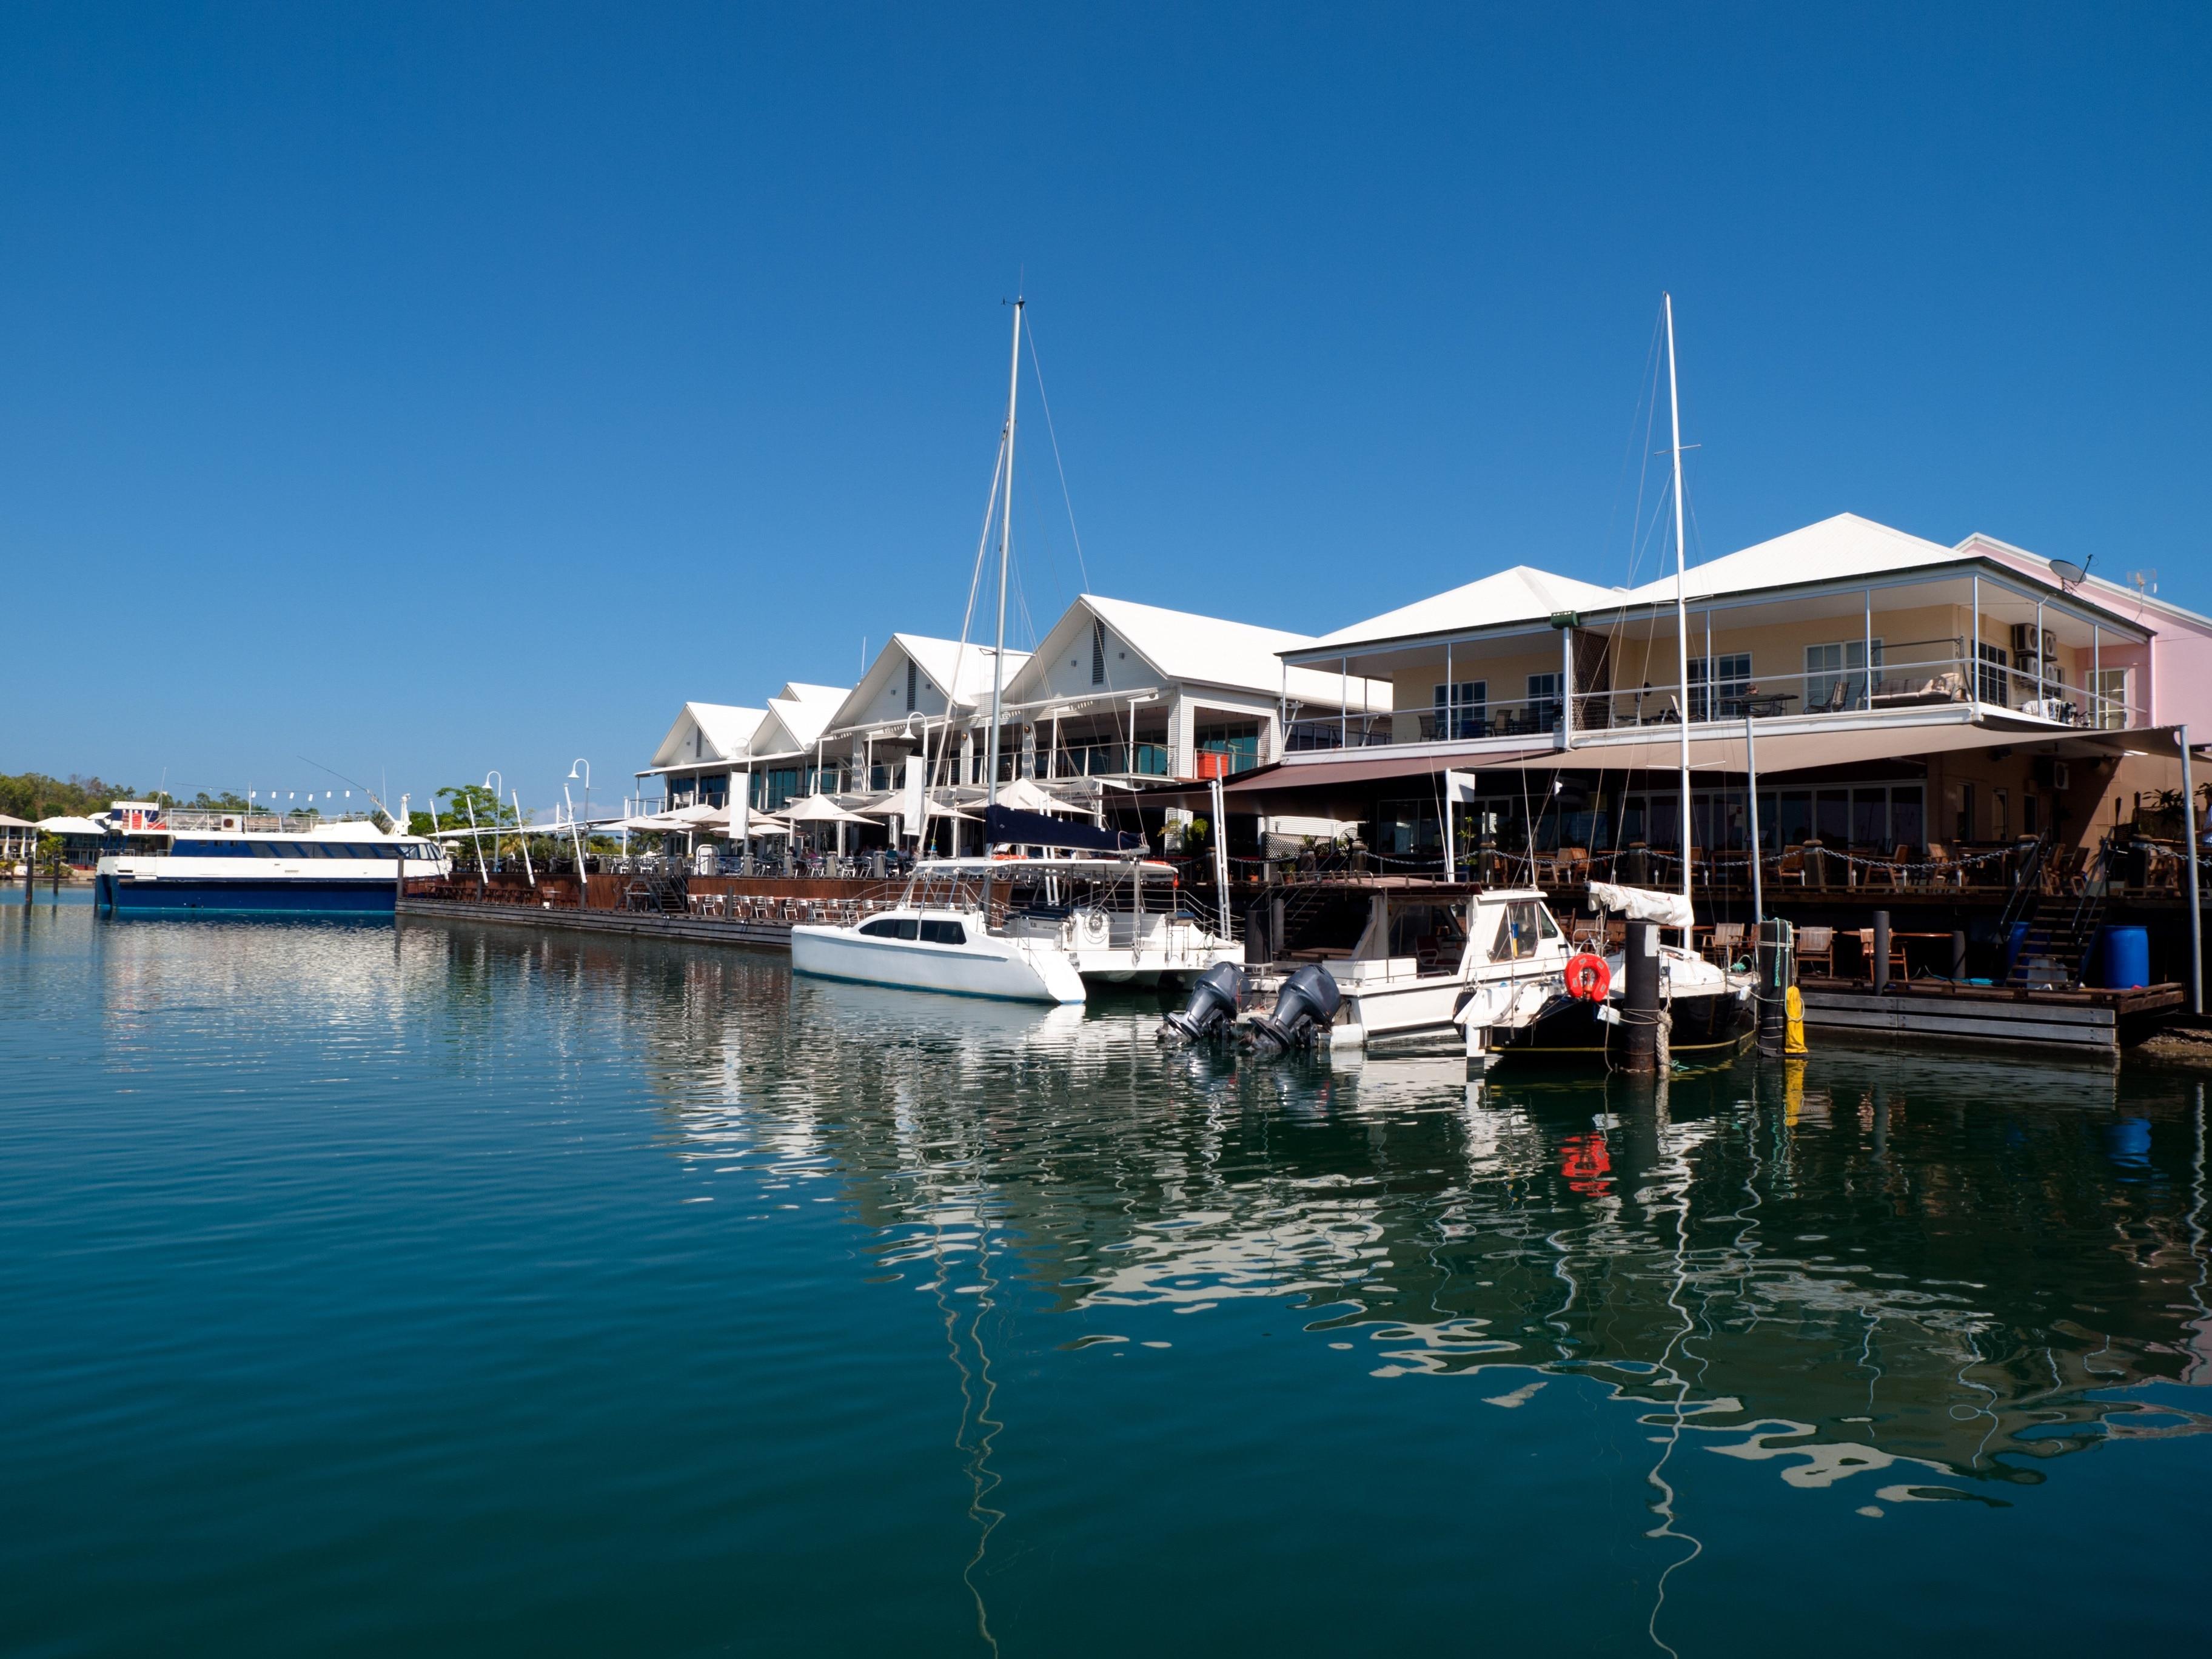 Cullen Bay Marina, Darwin, Northern Territory, Australia